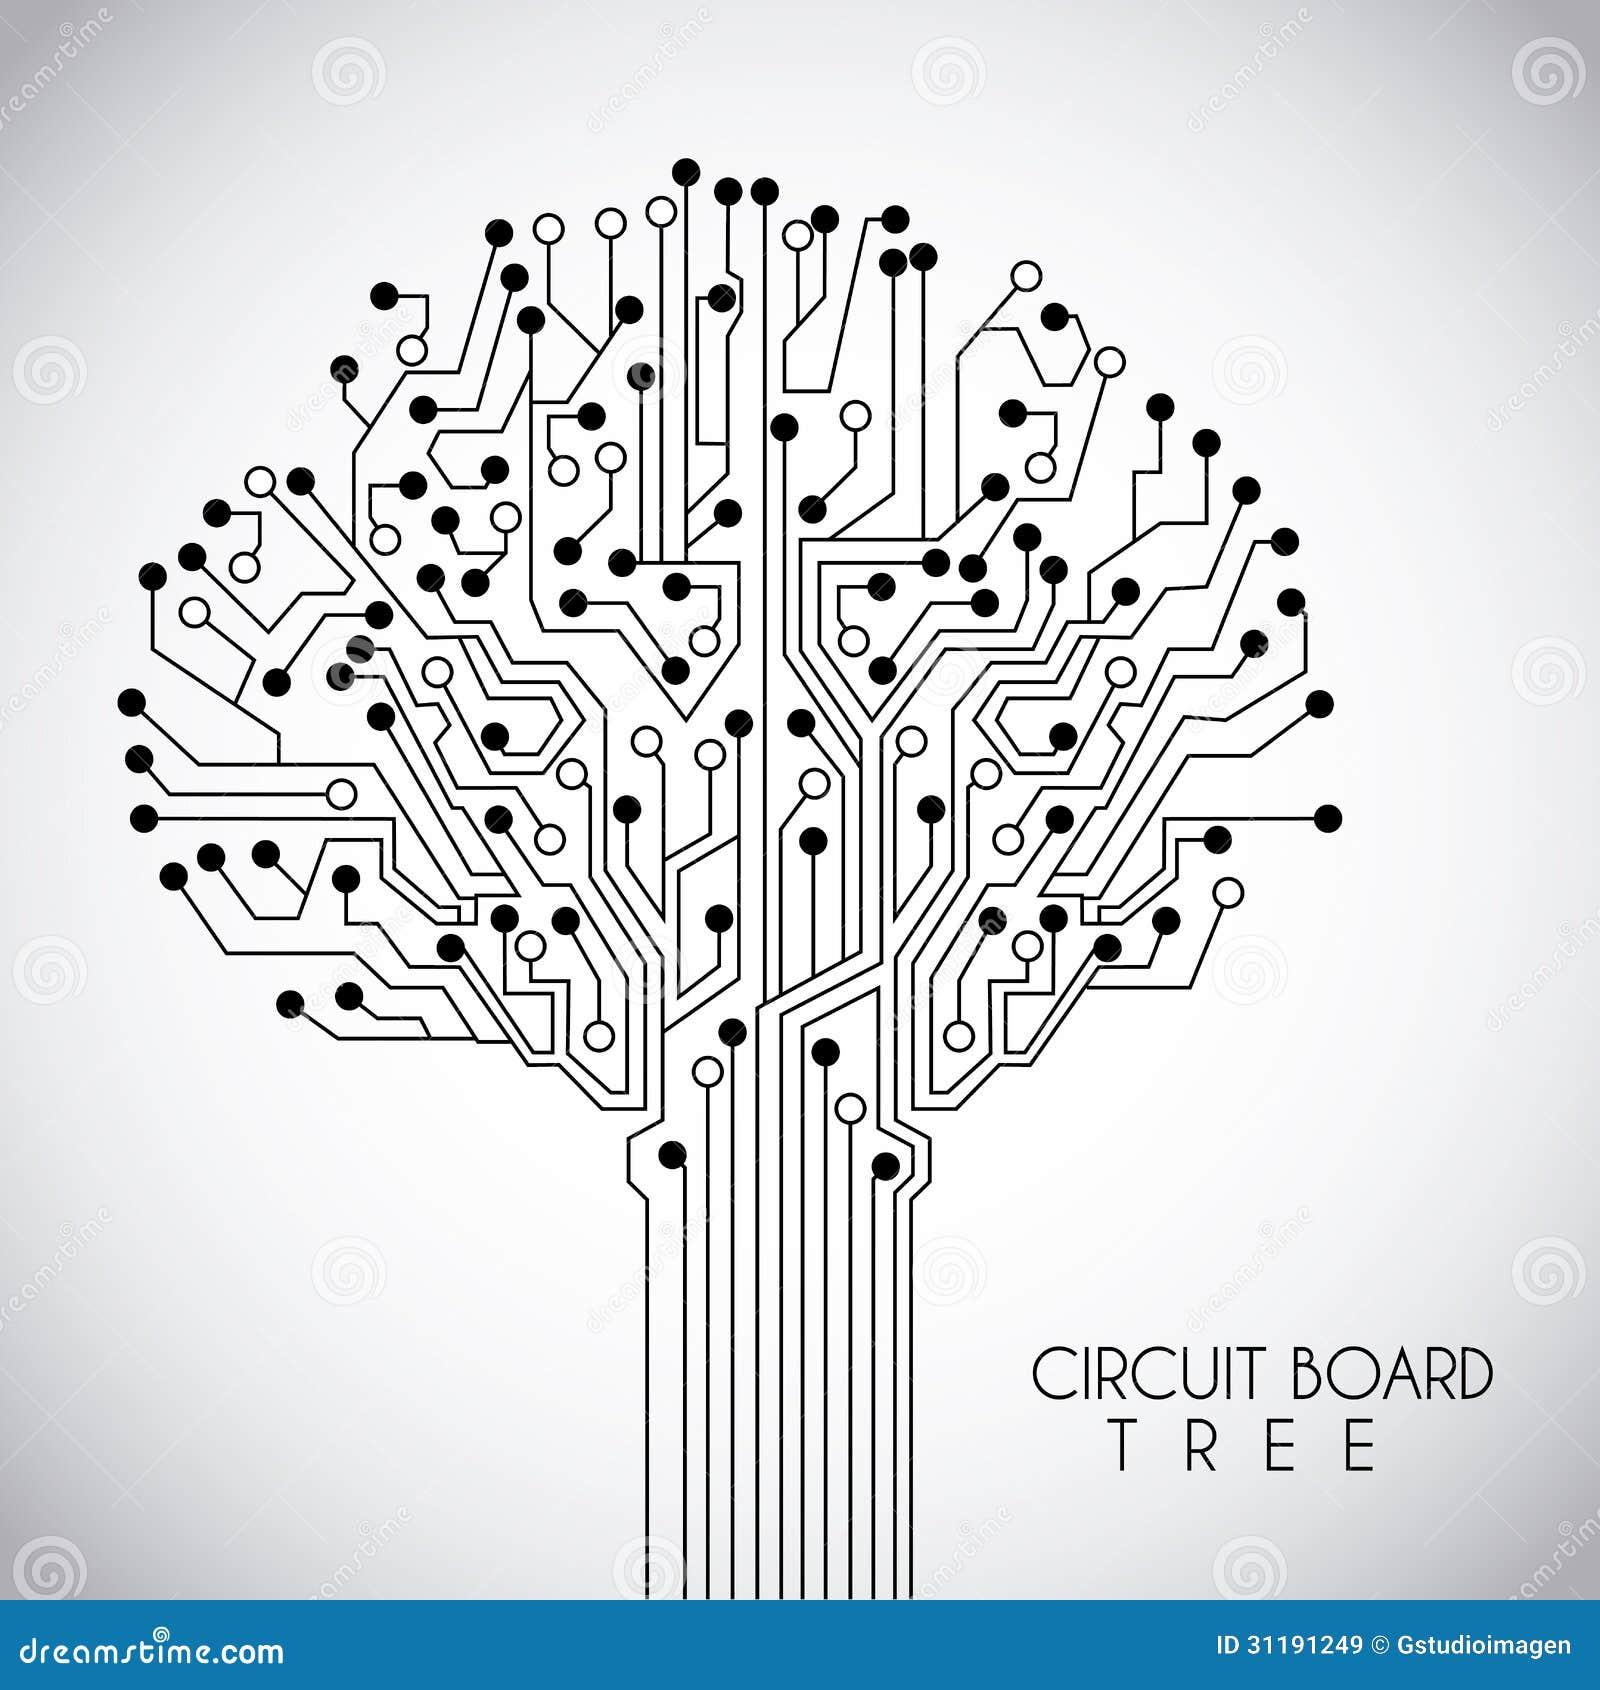 Circuit design stock vector. Illustration of idea, maze - 31191249